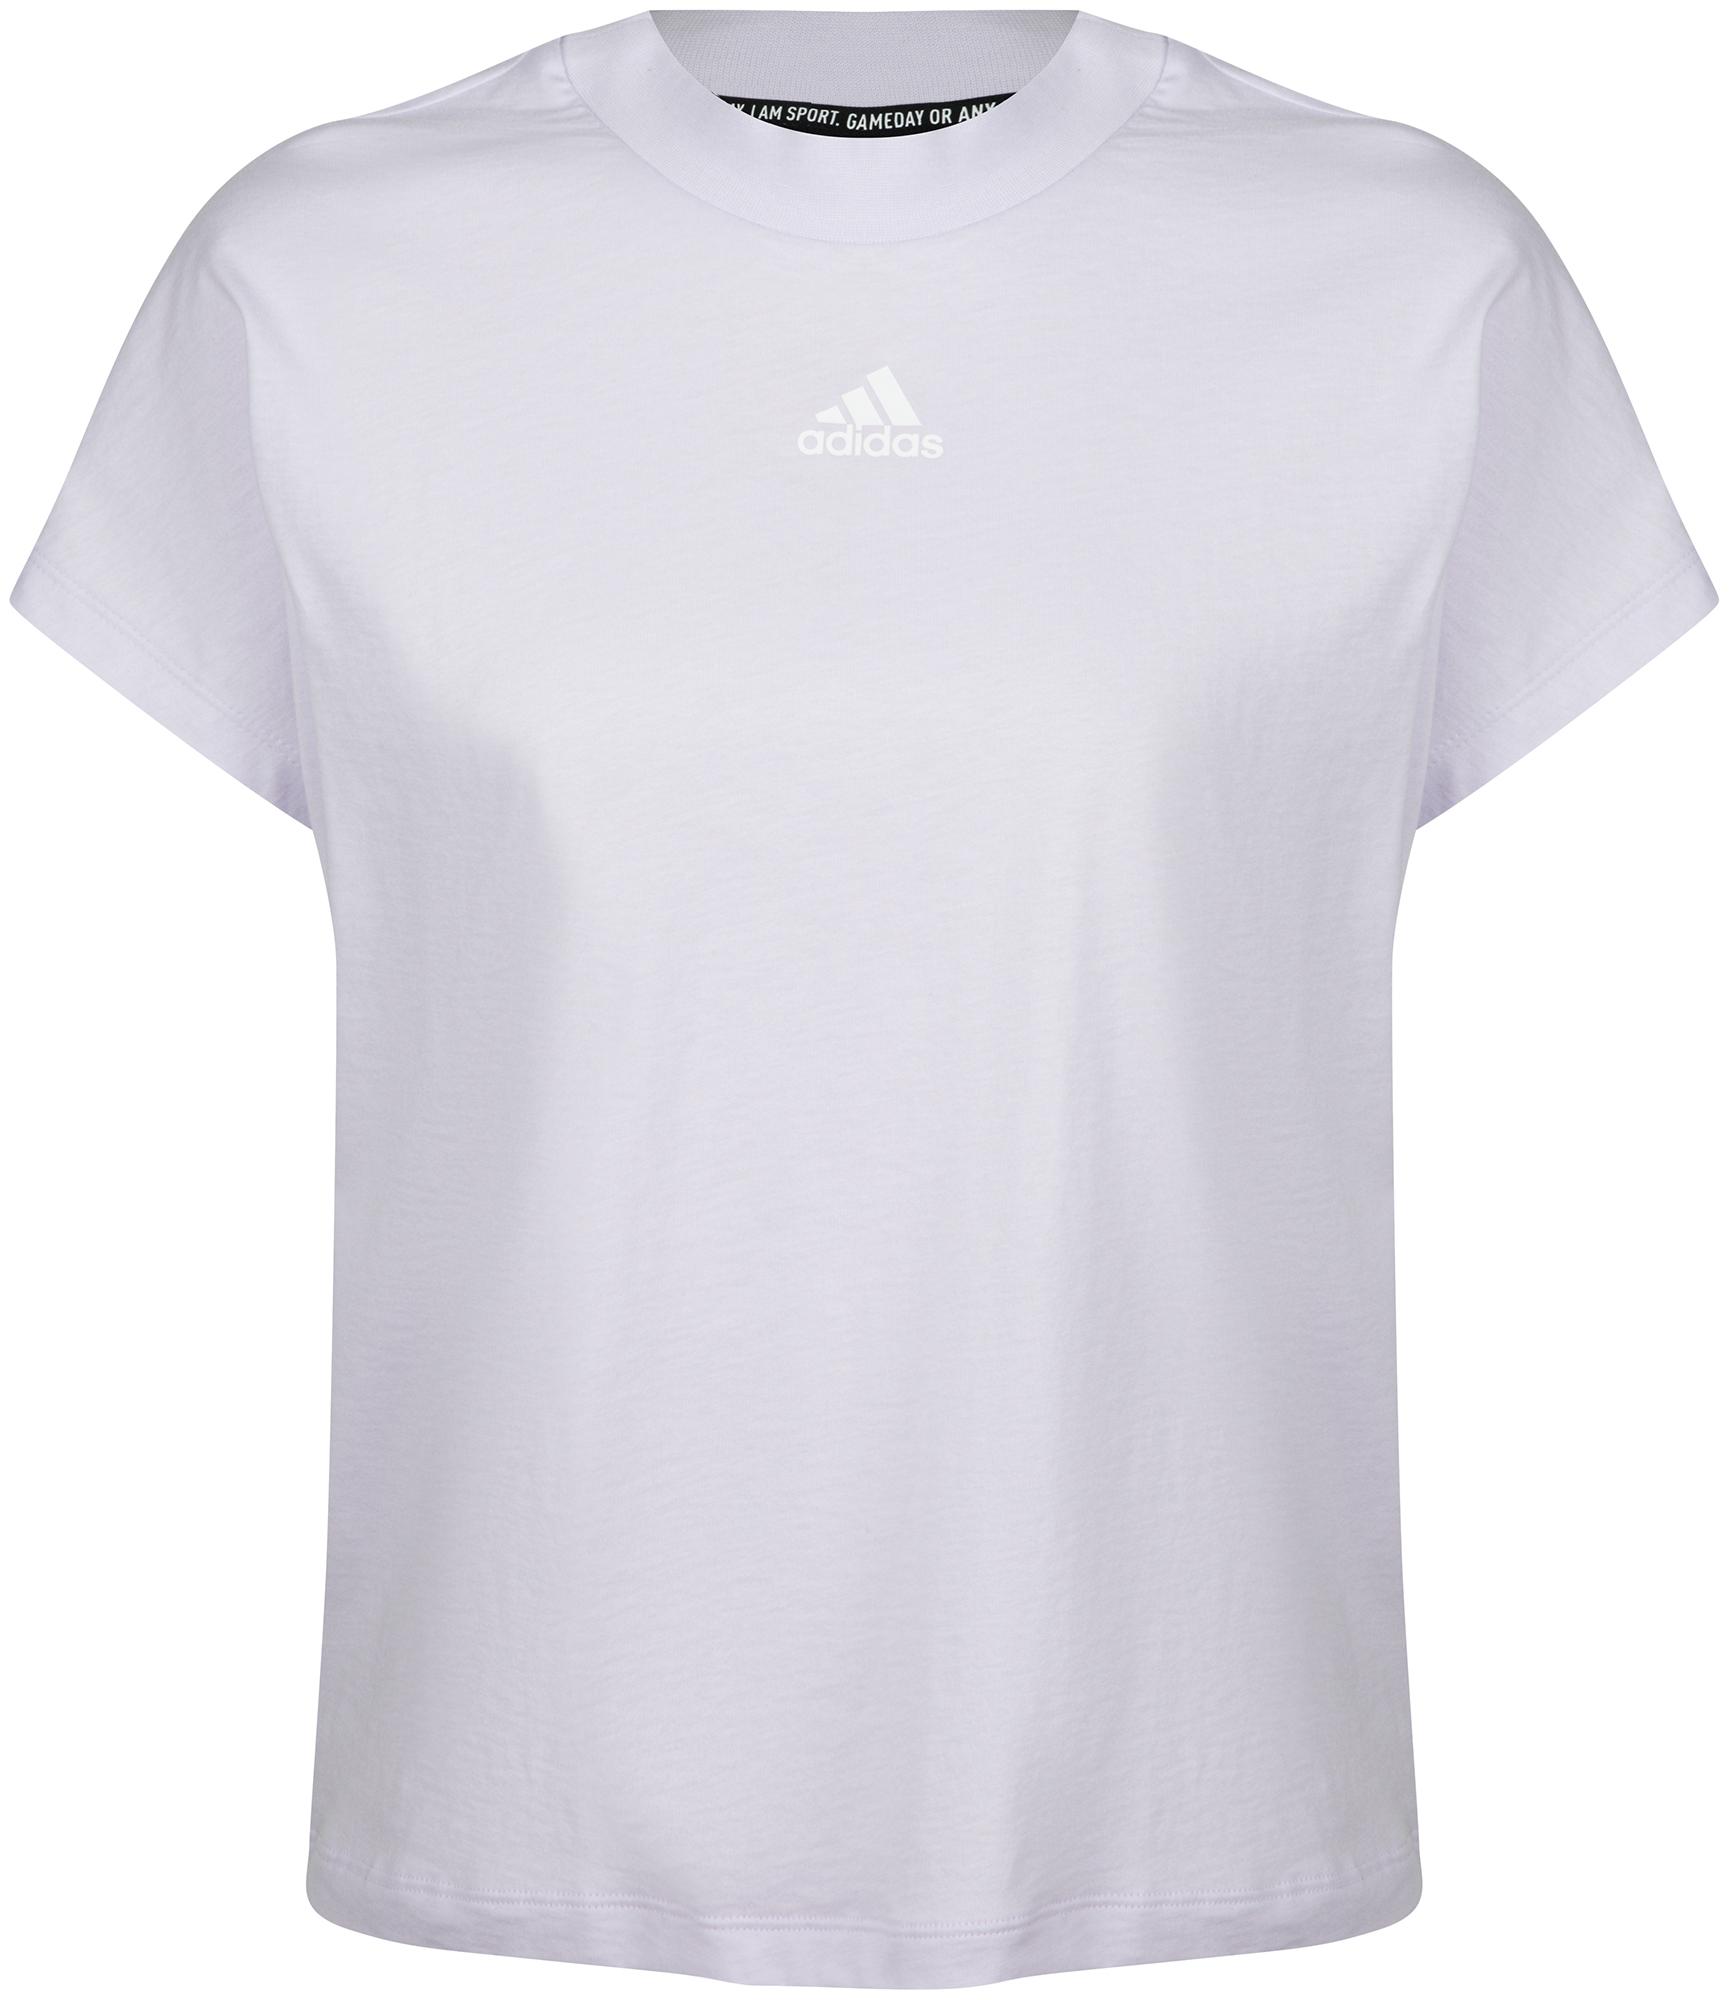 цены Adidas Футболка женская Adidas Must Haves 3-Stripes Tee, размер 50-52